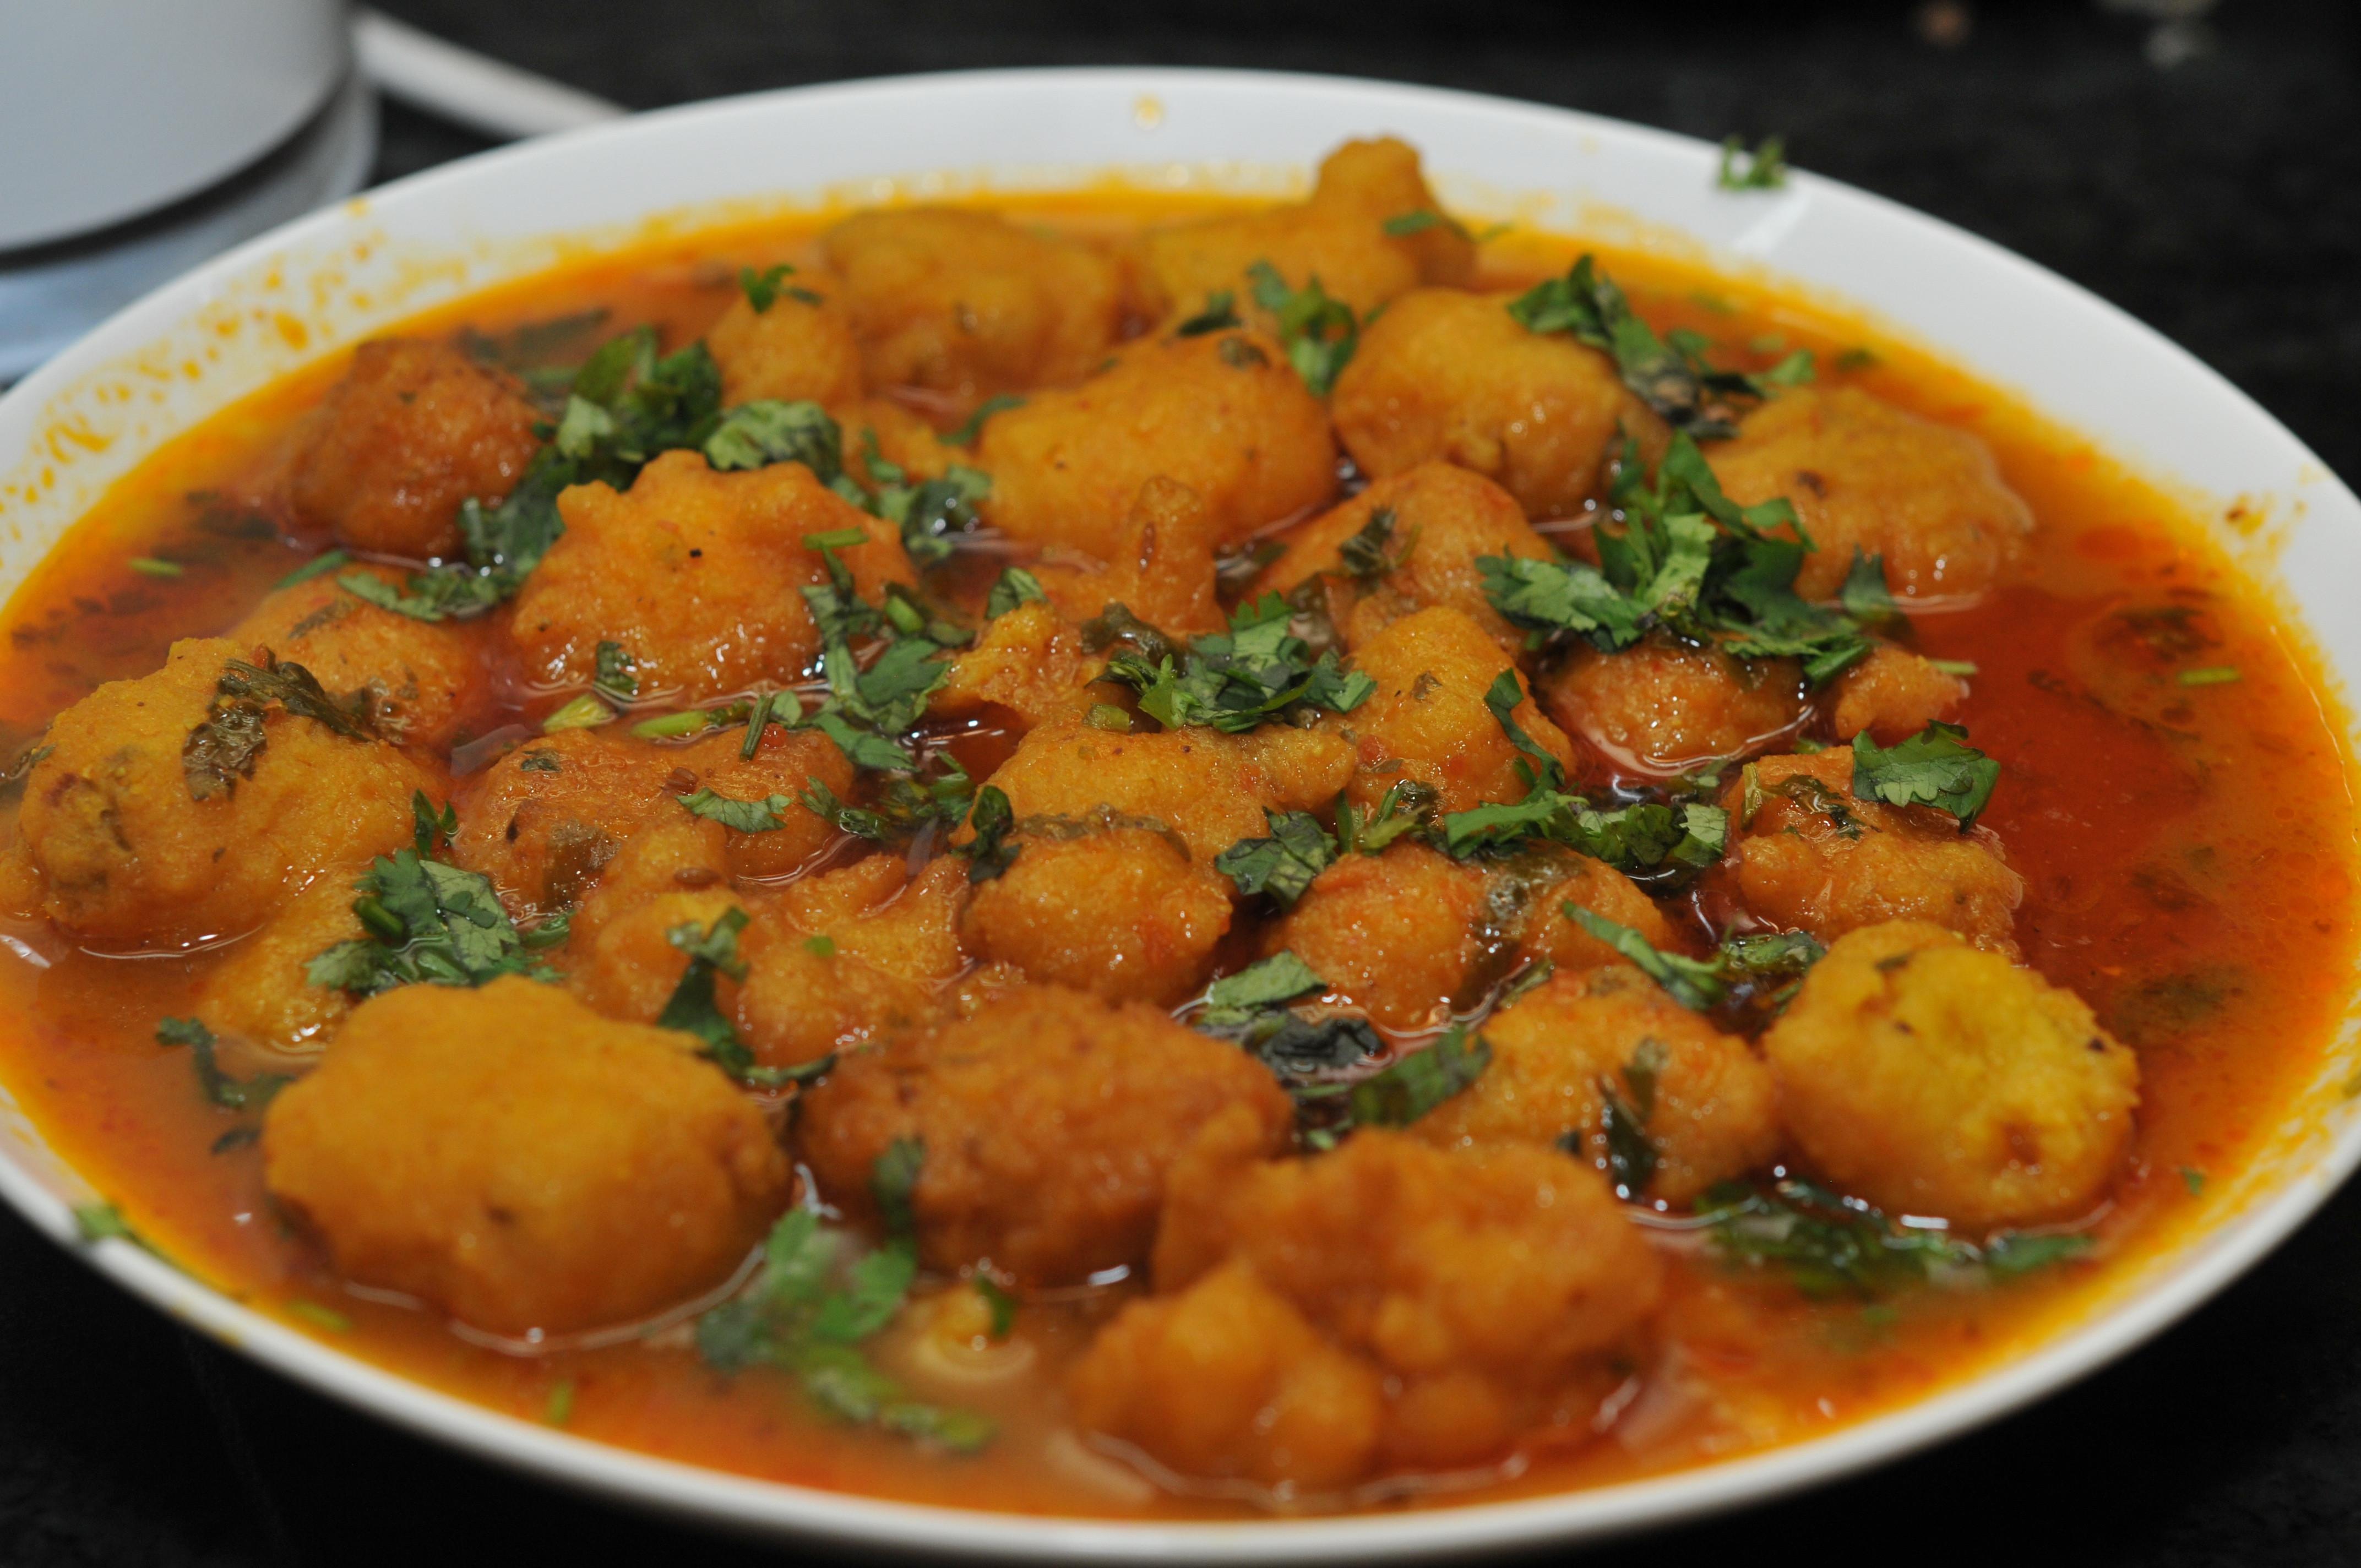 Vegetarian Indian Food Recipes  Food Recipes Recipes Ve arian Indian Food